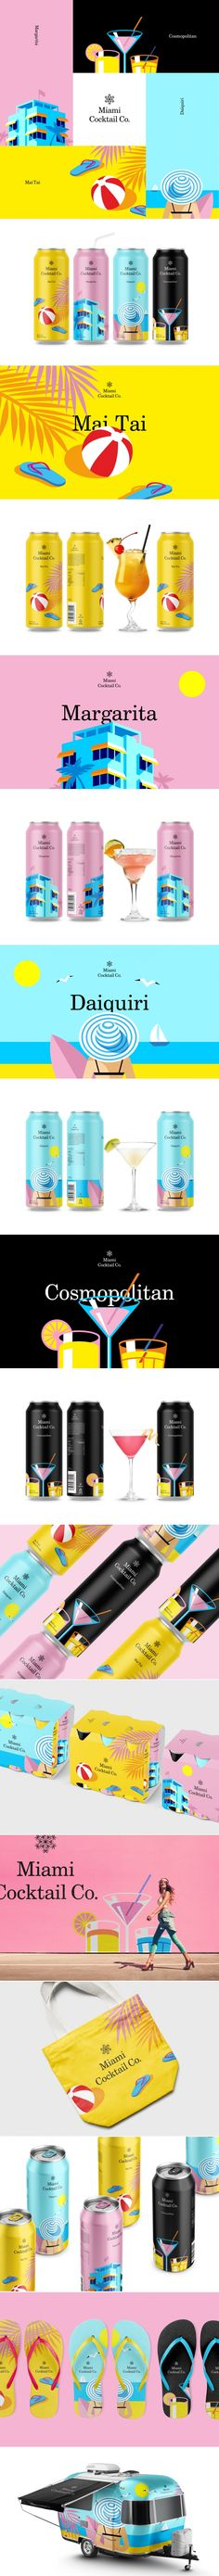 Miami Cocktail Co. Branding and Packaging by Berik Yergaliyev | Fivestar Branding Agency – Design and Branding Agency & Curated Inspiration Gallery #cocktails #branding #packaging #design #behance #pinterest #dribbble #fivestarbranding